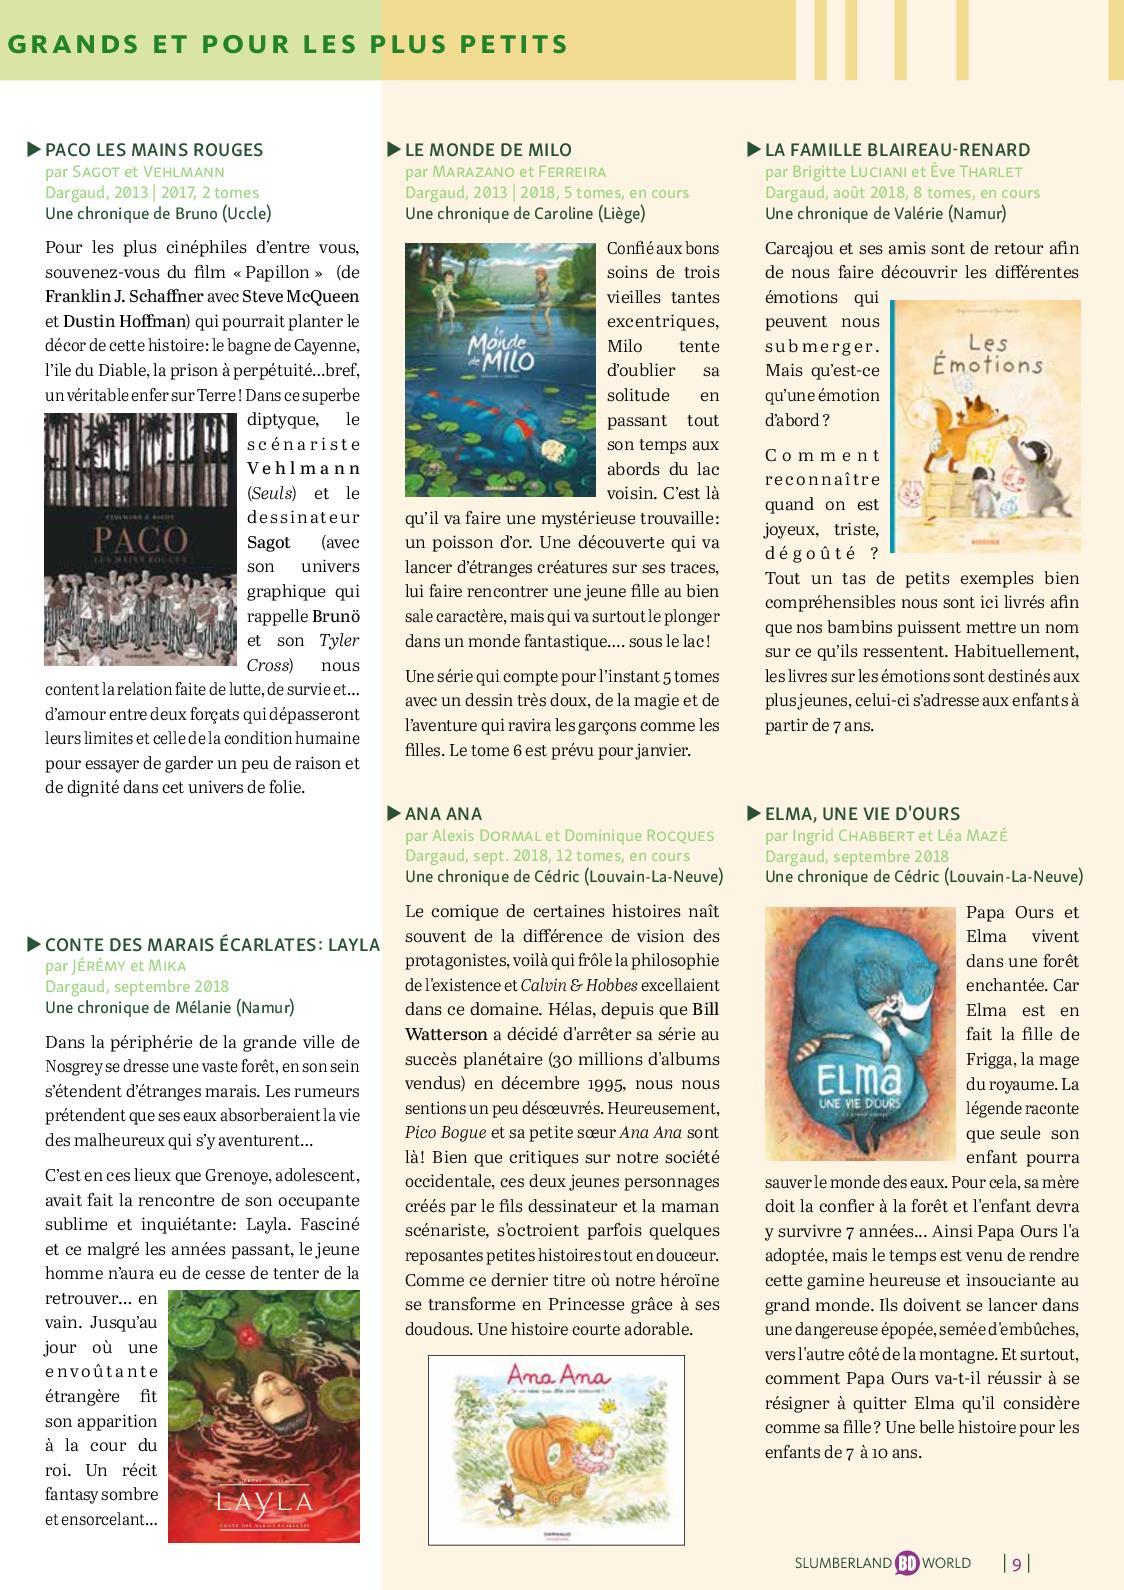 Comment Rencontrer Ses Voisins magazine slumberland bd world #41 - calameo downloader